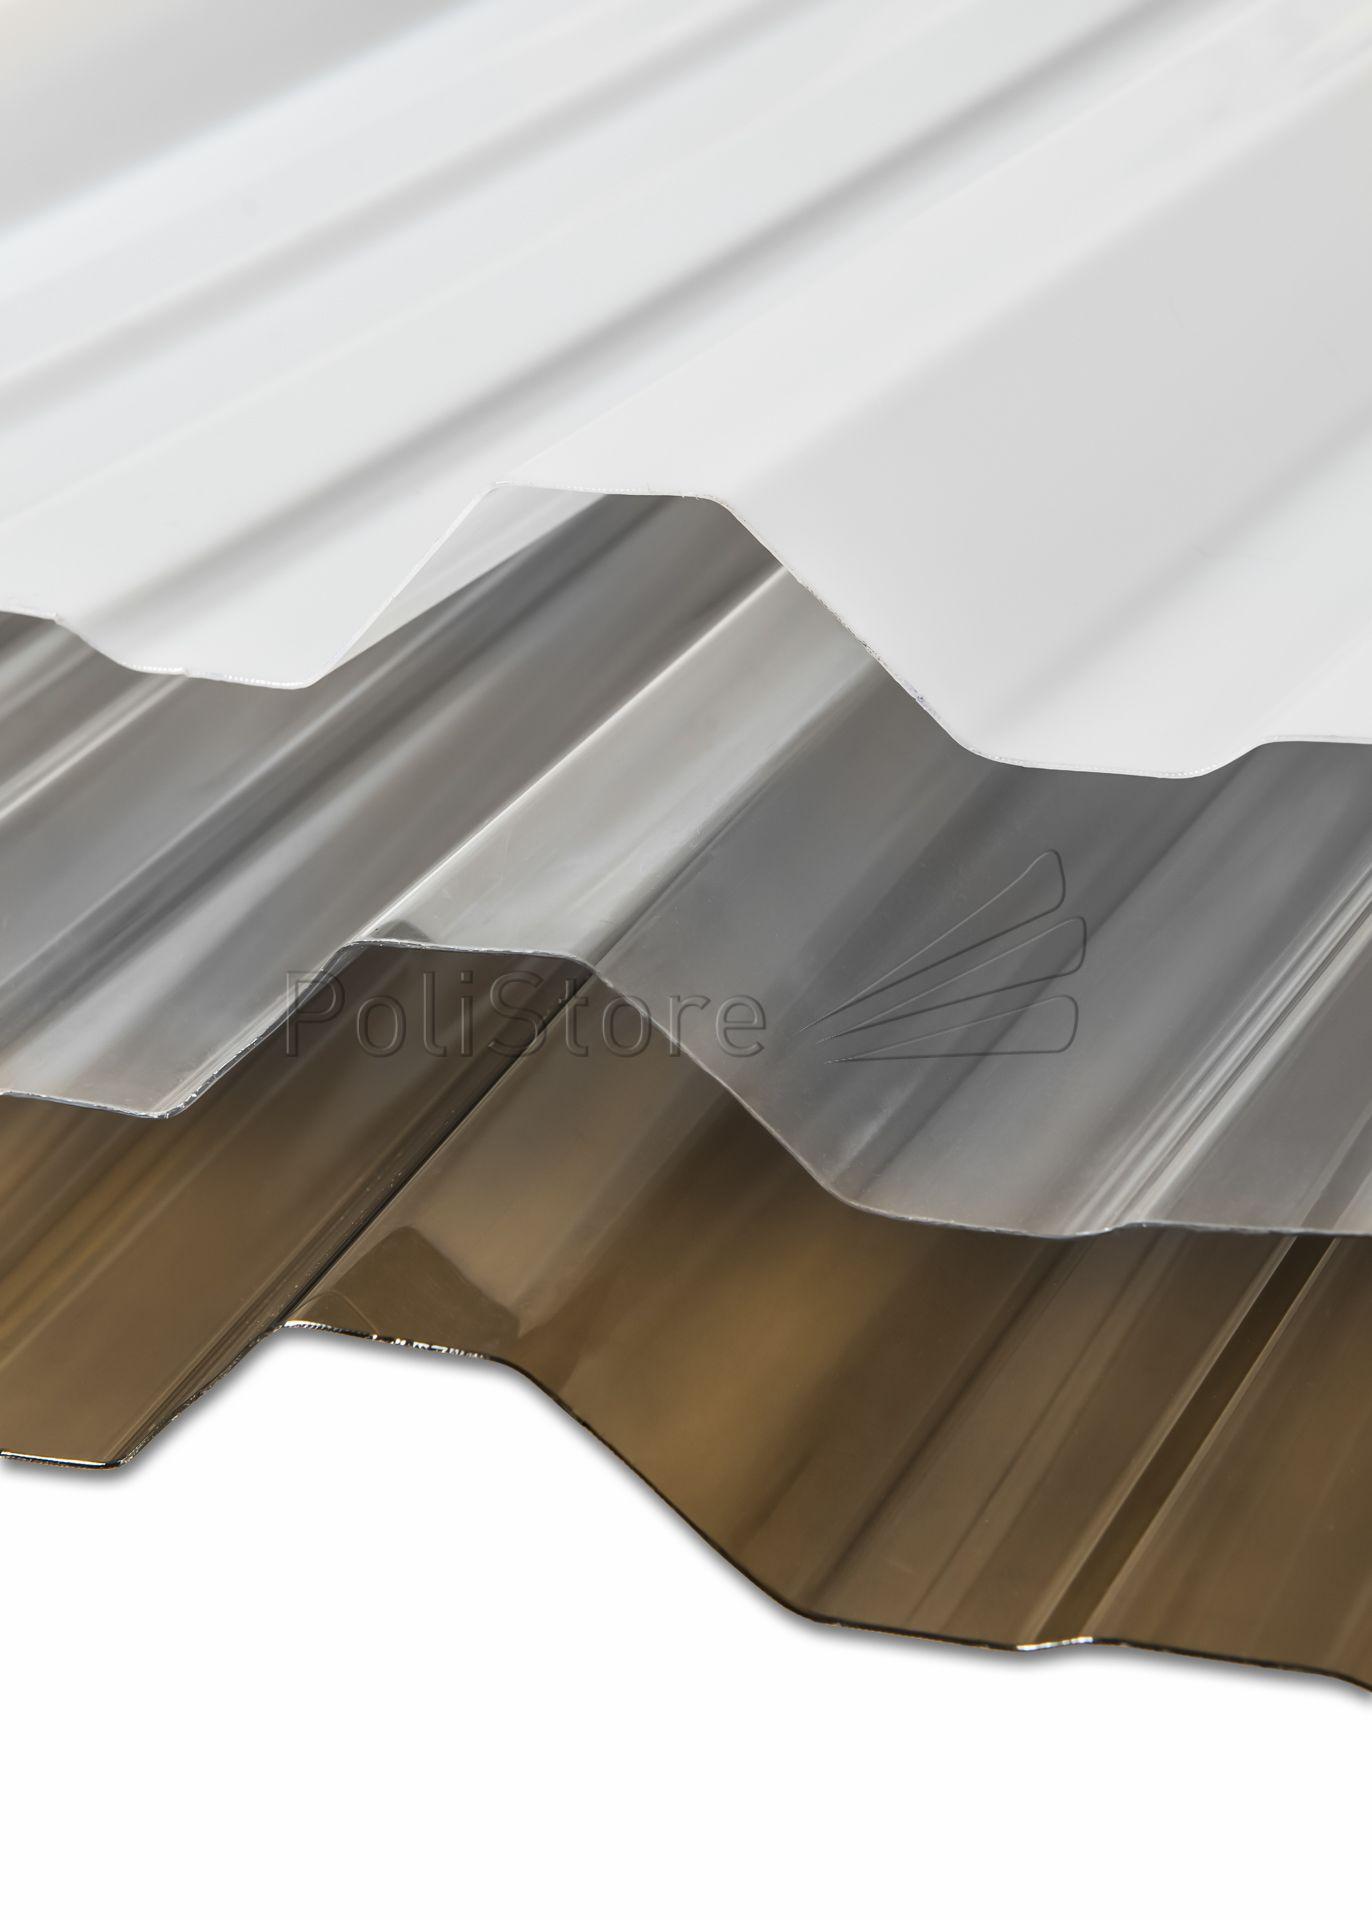 Chapa de Policarbonato Trapezoidal T101 0.8 mm